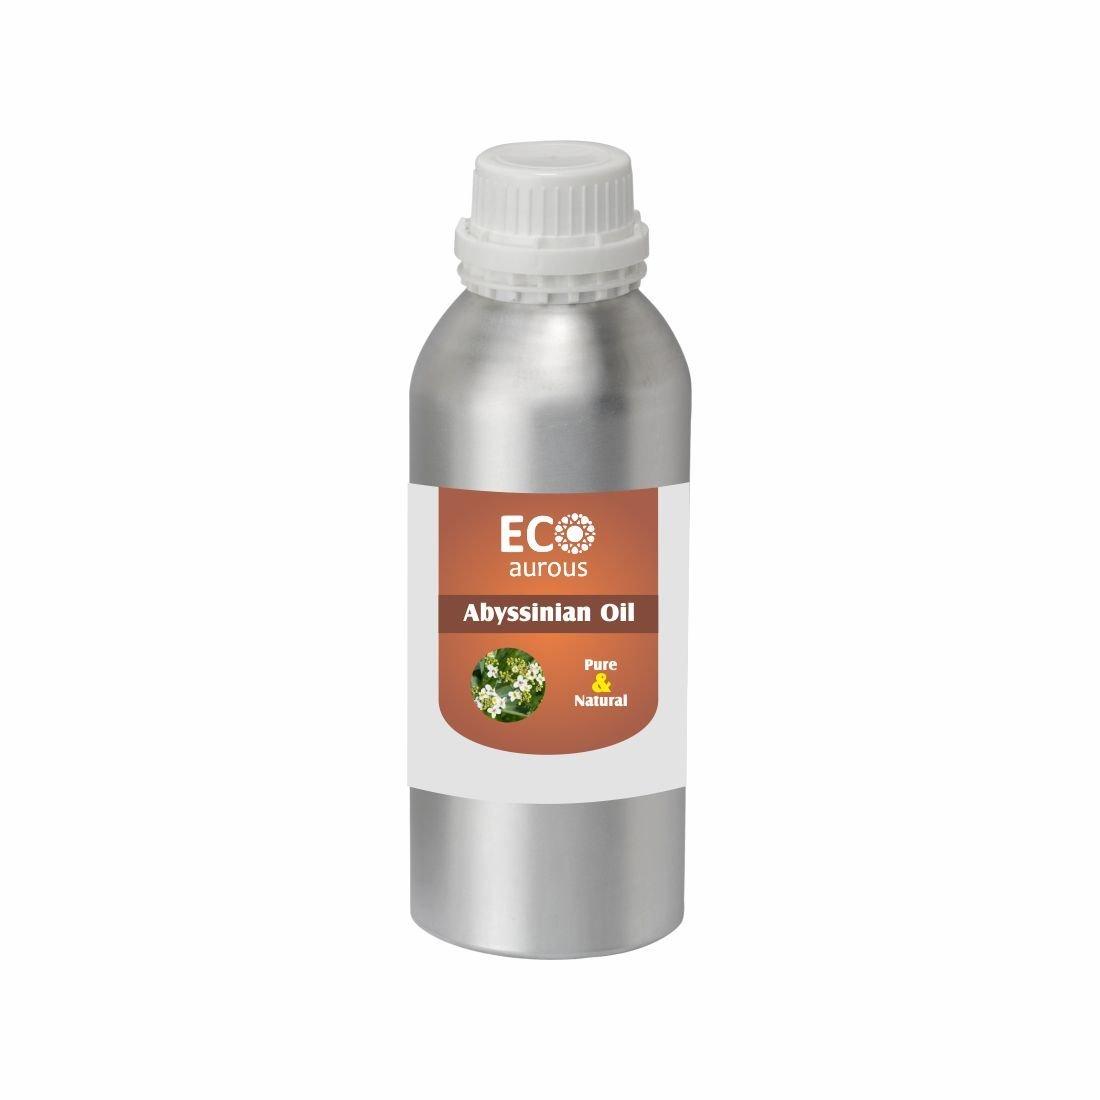 Abyssinian Oil | Abyssinian Oil For hair, Hair growth | Crambe Oil | Crambe Abyssinica oil|Abyssinian Essential Oil (50ml(1.69oz)) Tosc International Pvt Ltd